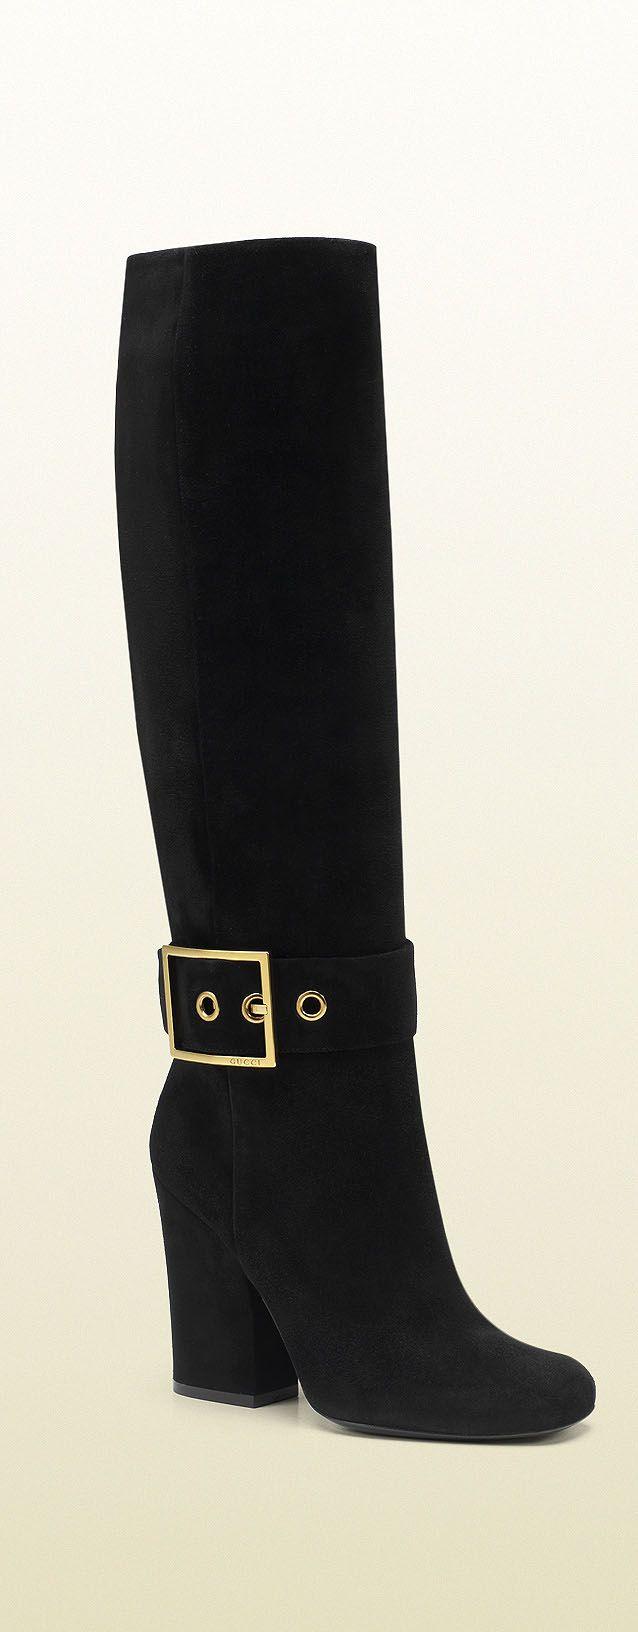 Gucci boots...LOVE Repin & Follow my pins for a FOLLOWBACK! Beautifuls.com Members VIP Fashion Club 40-80% Off Luxury Fashion Brands